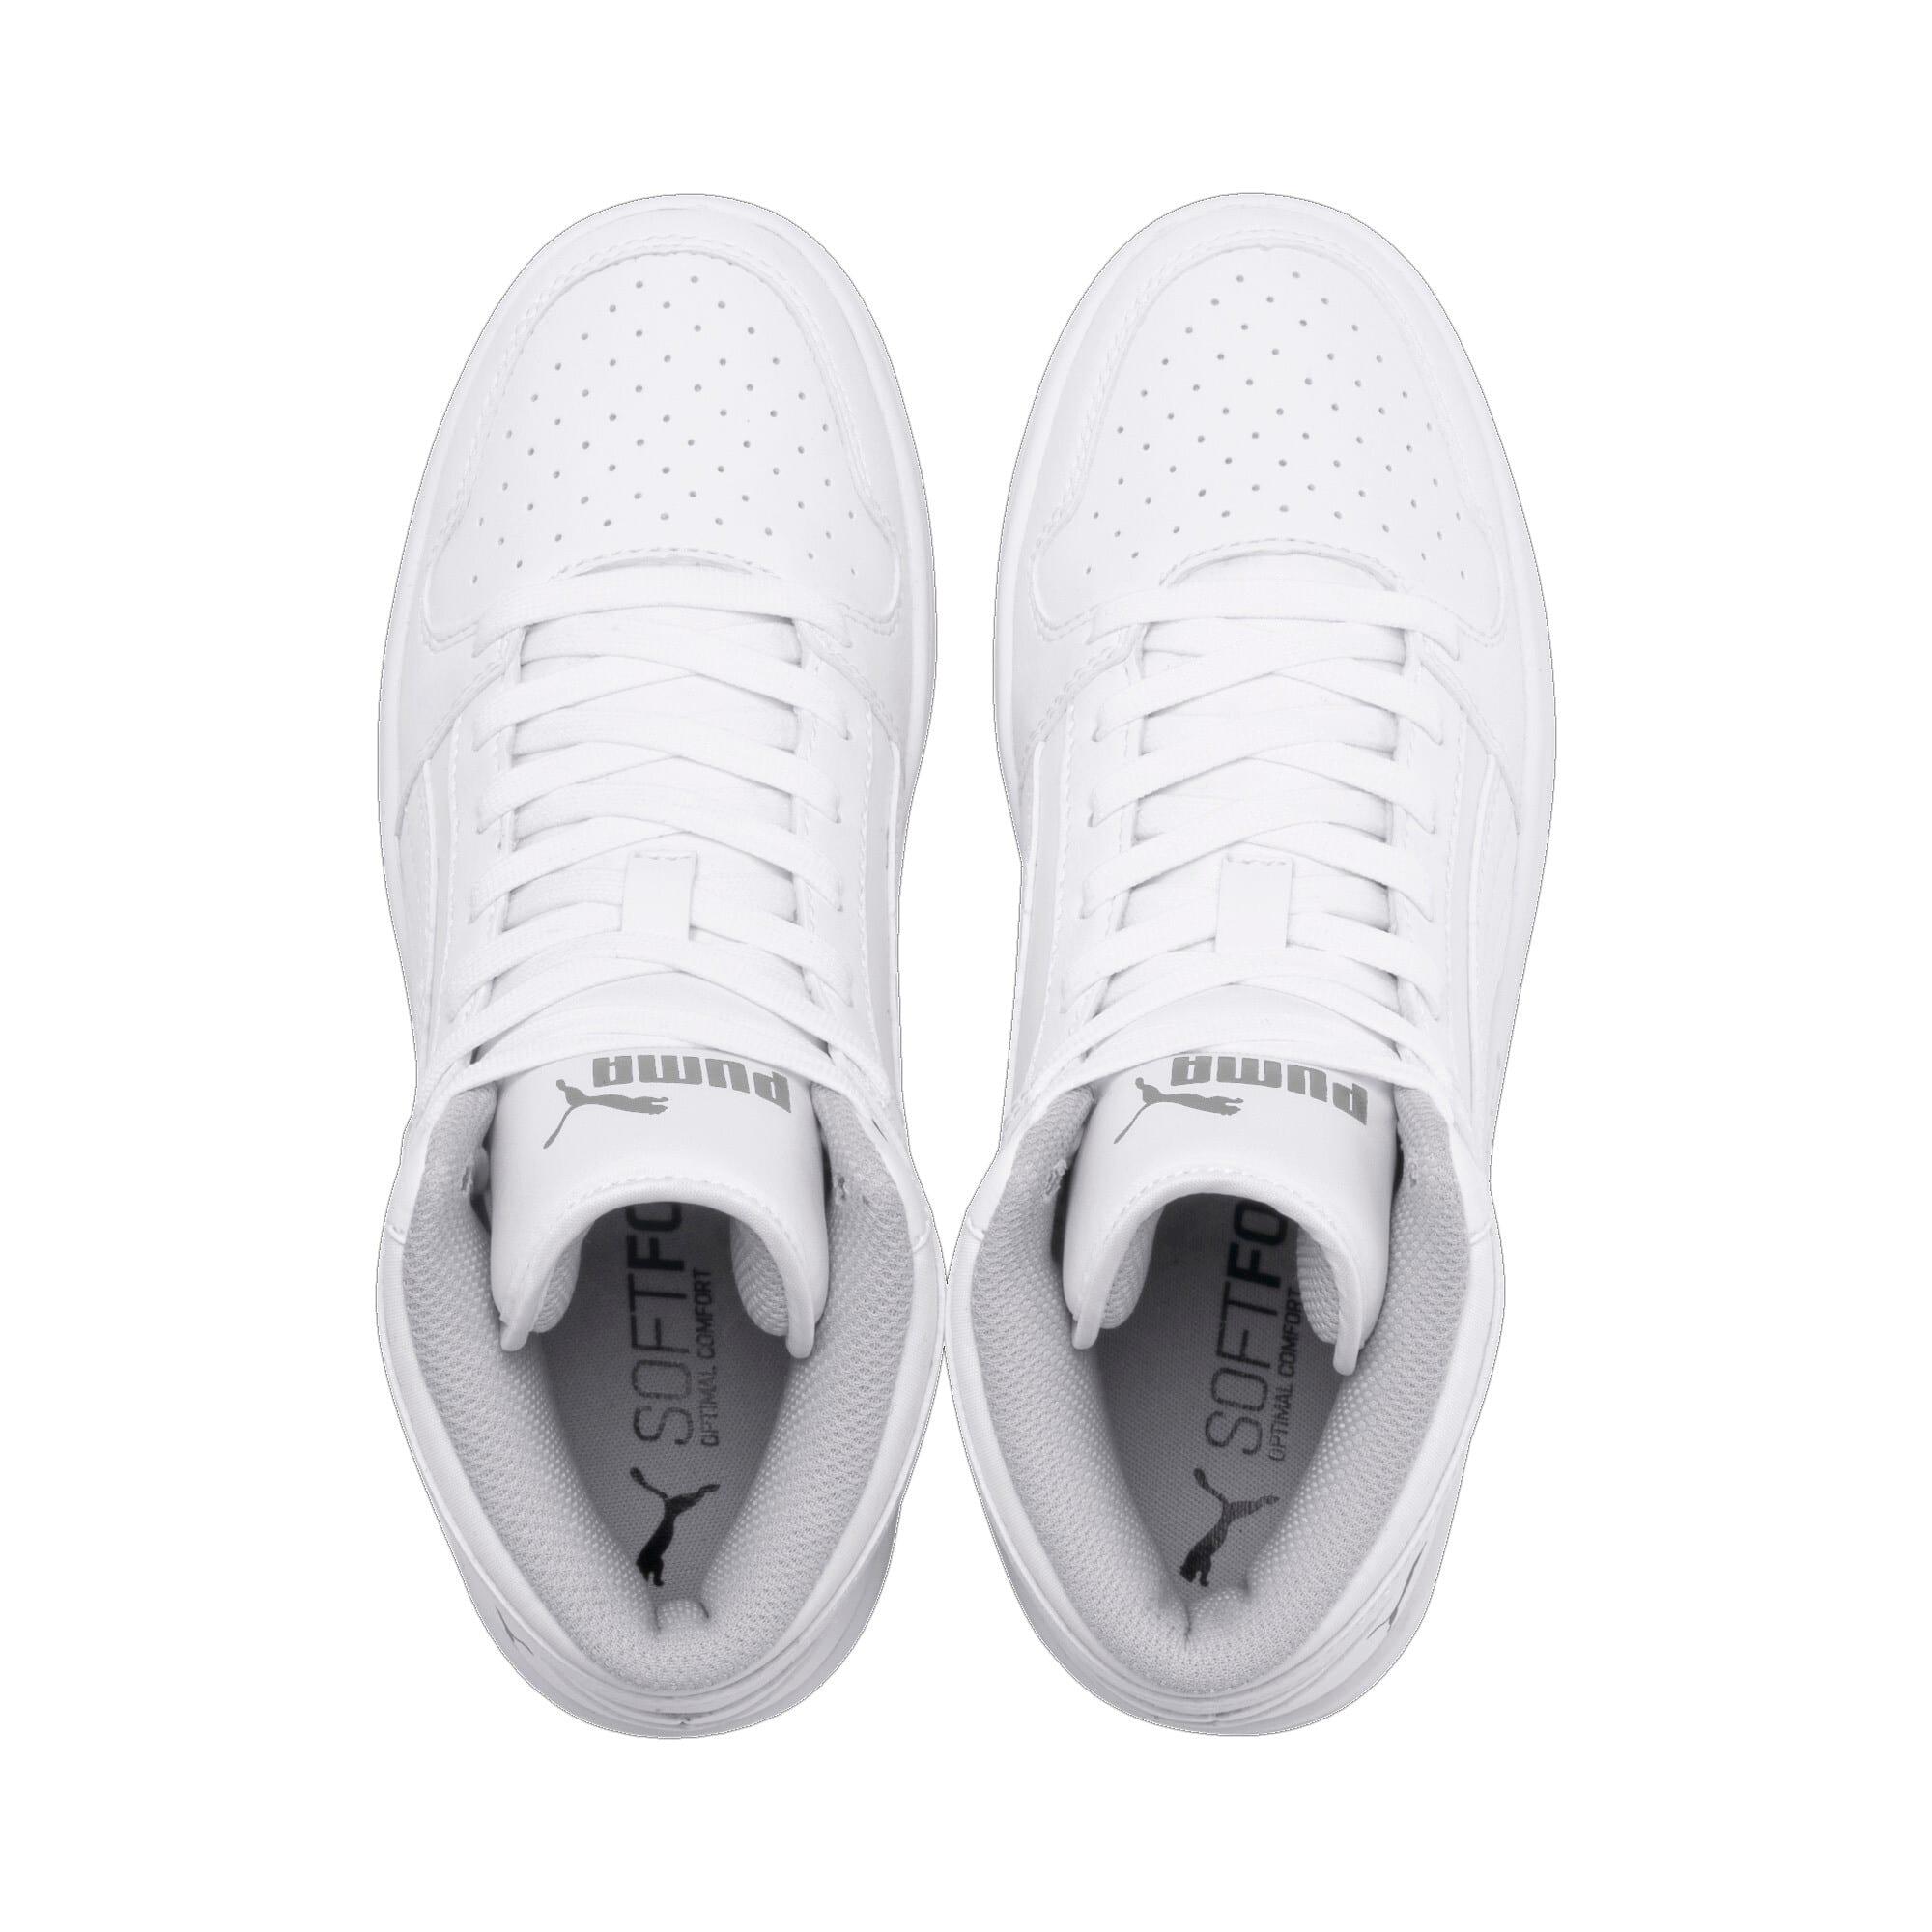 Thumbnail 6 of PUMA Rebound LayUp Mid Sneakers JR, Puma White-Gray Violet, medium